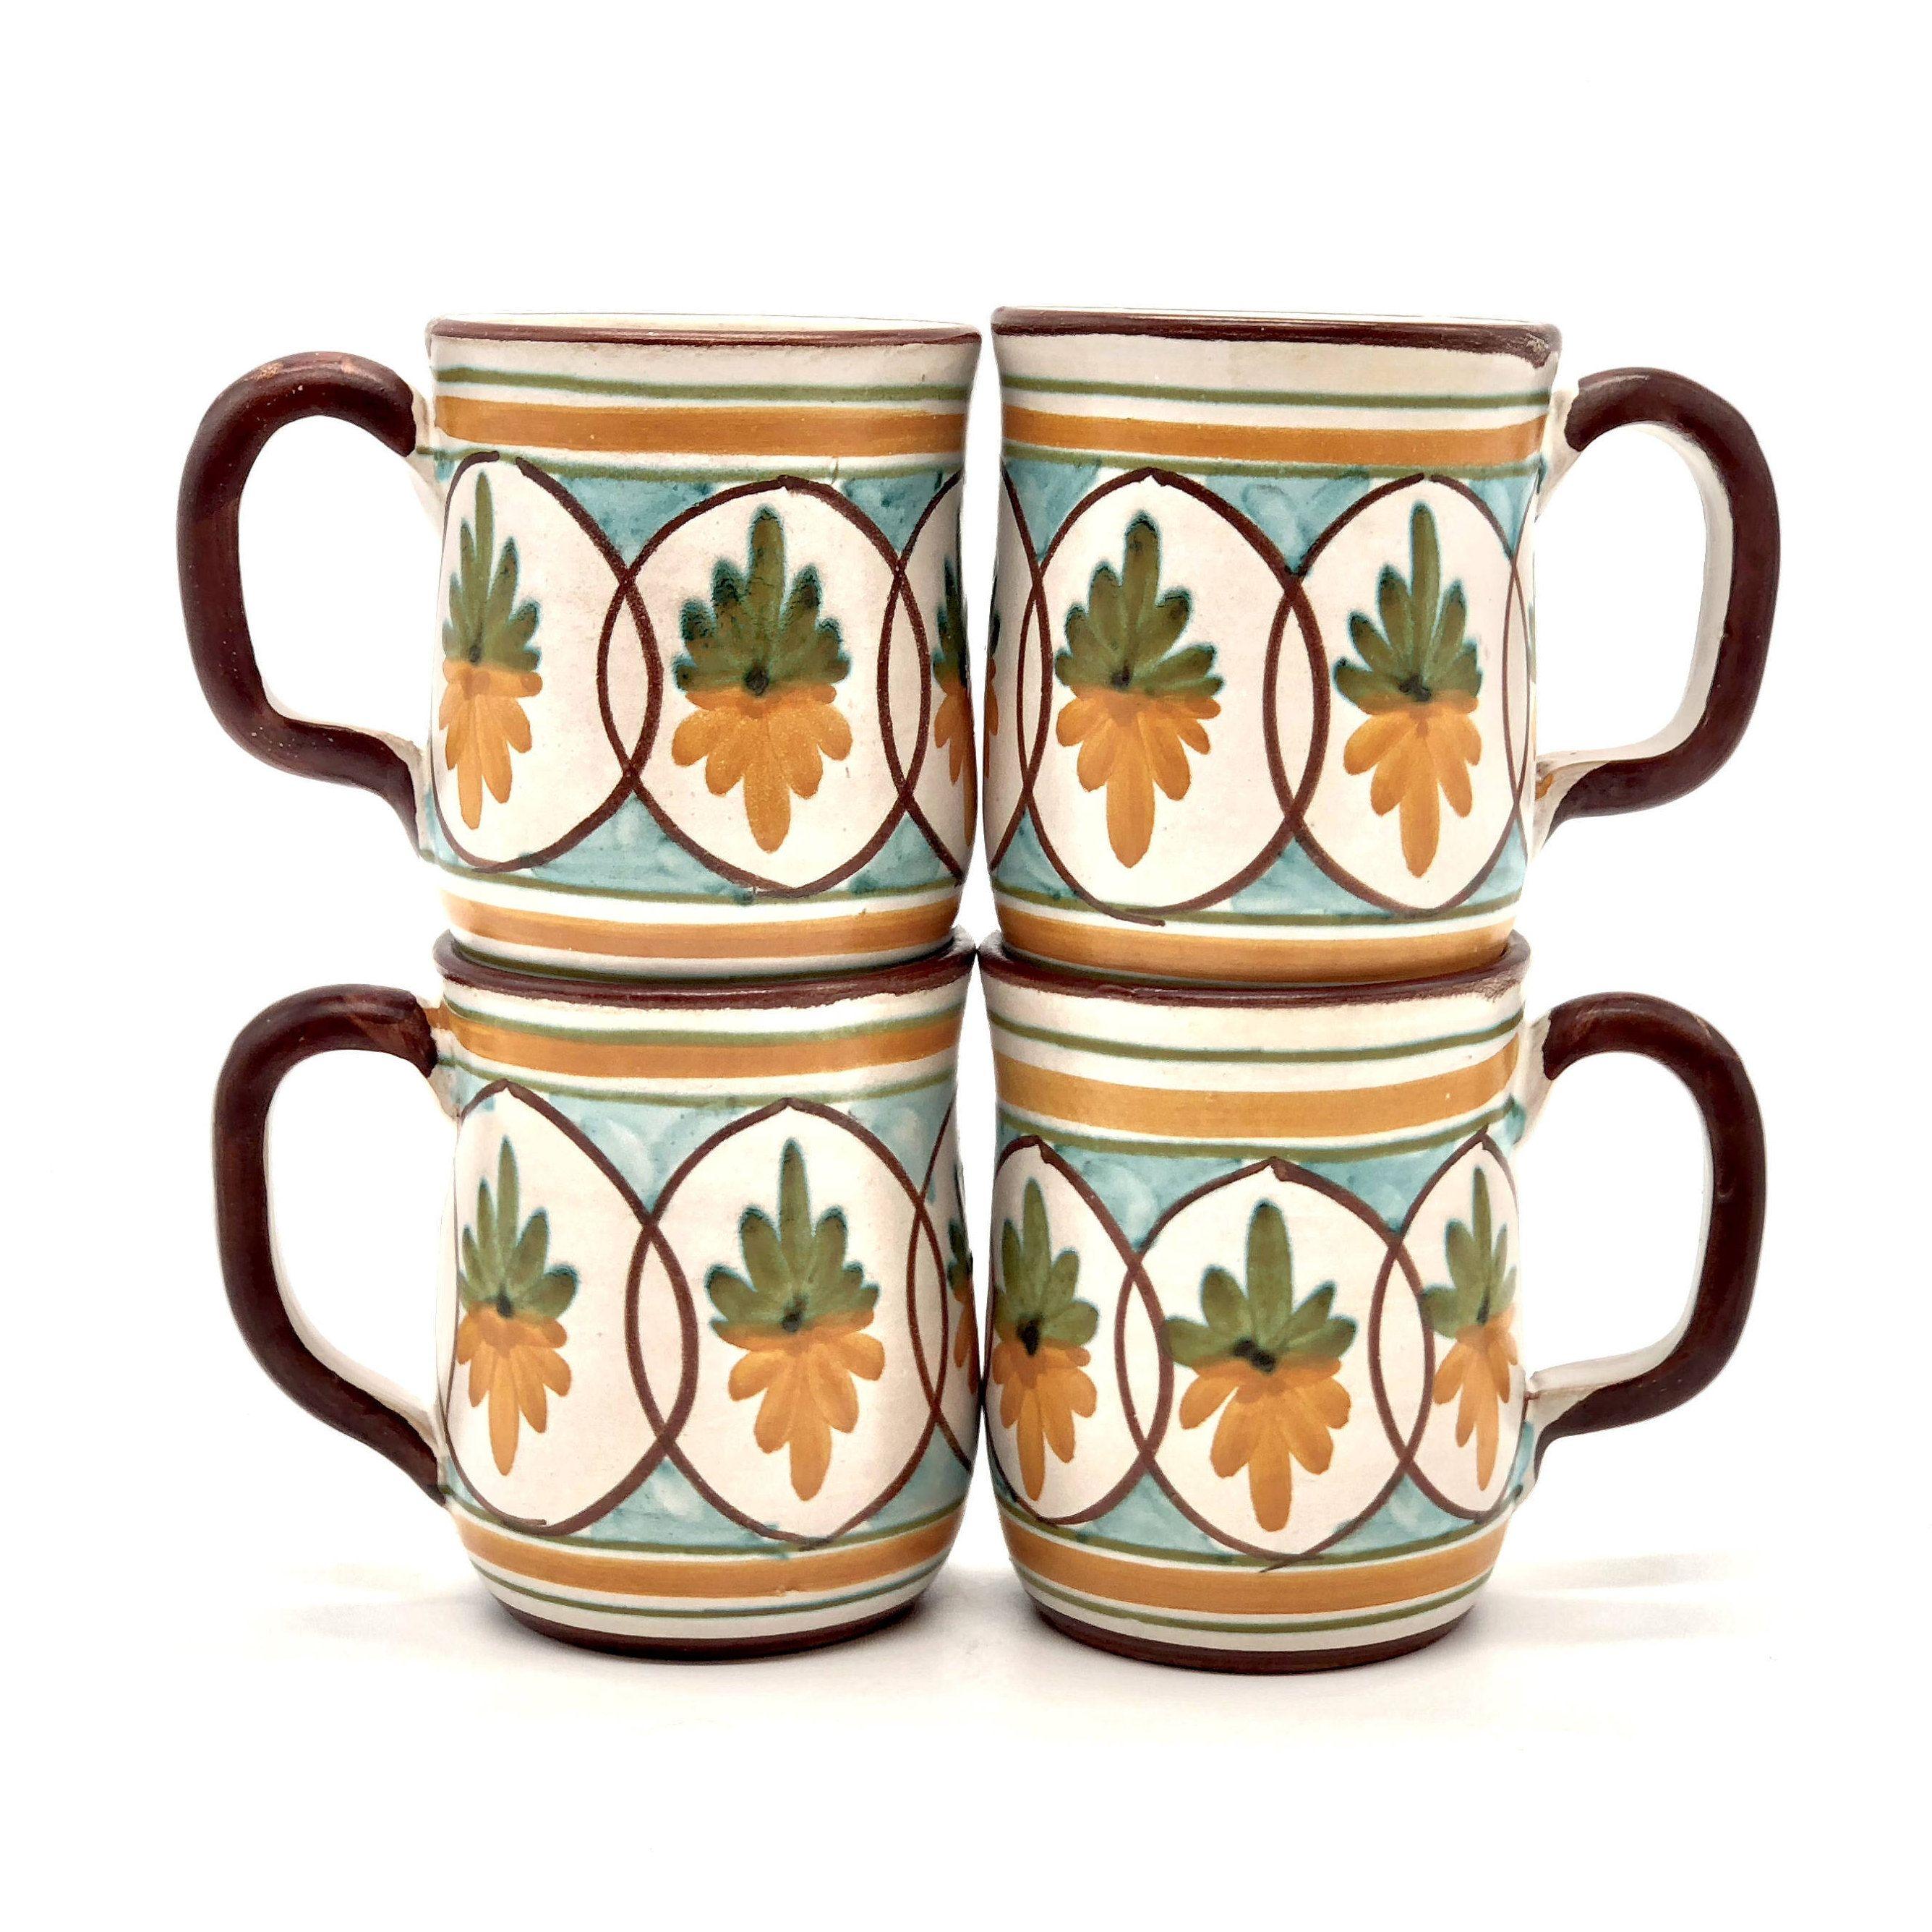 Italian Coffee Cups, 70s Ceramic Mug Set of 4 by